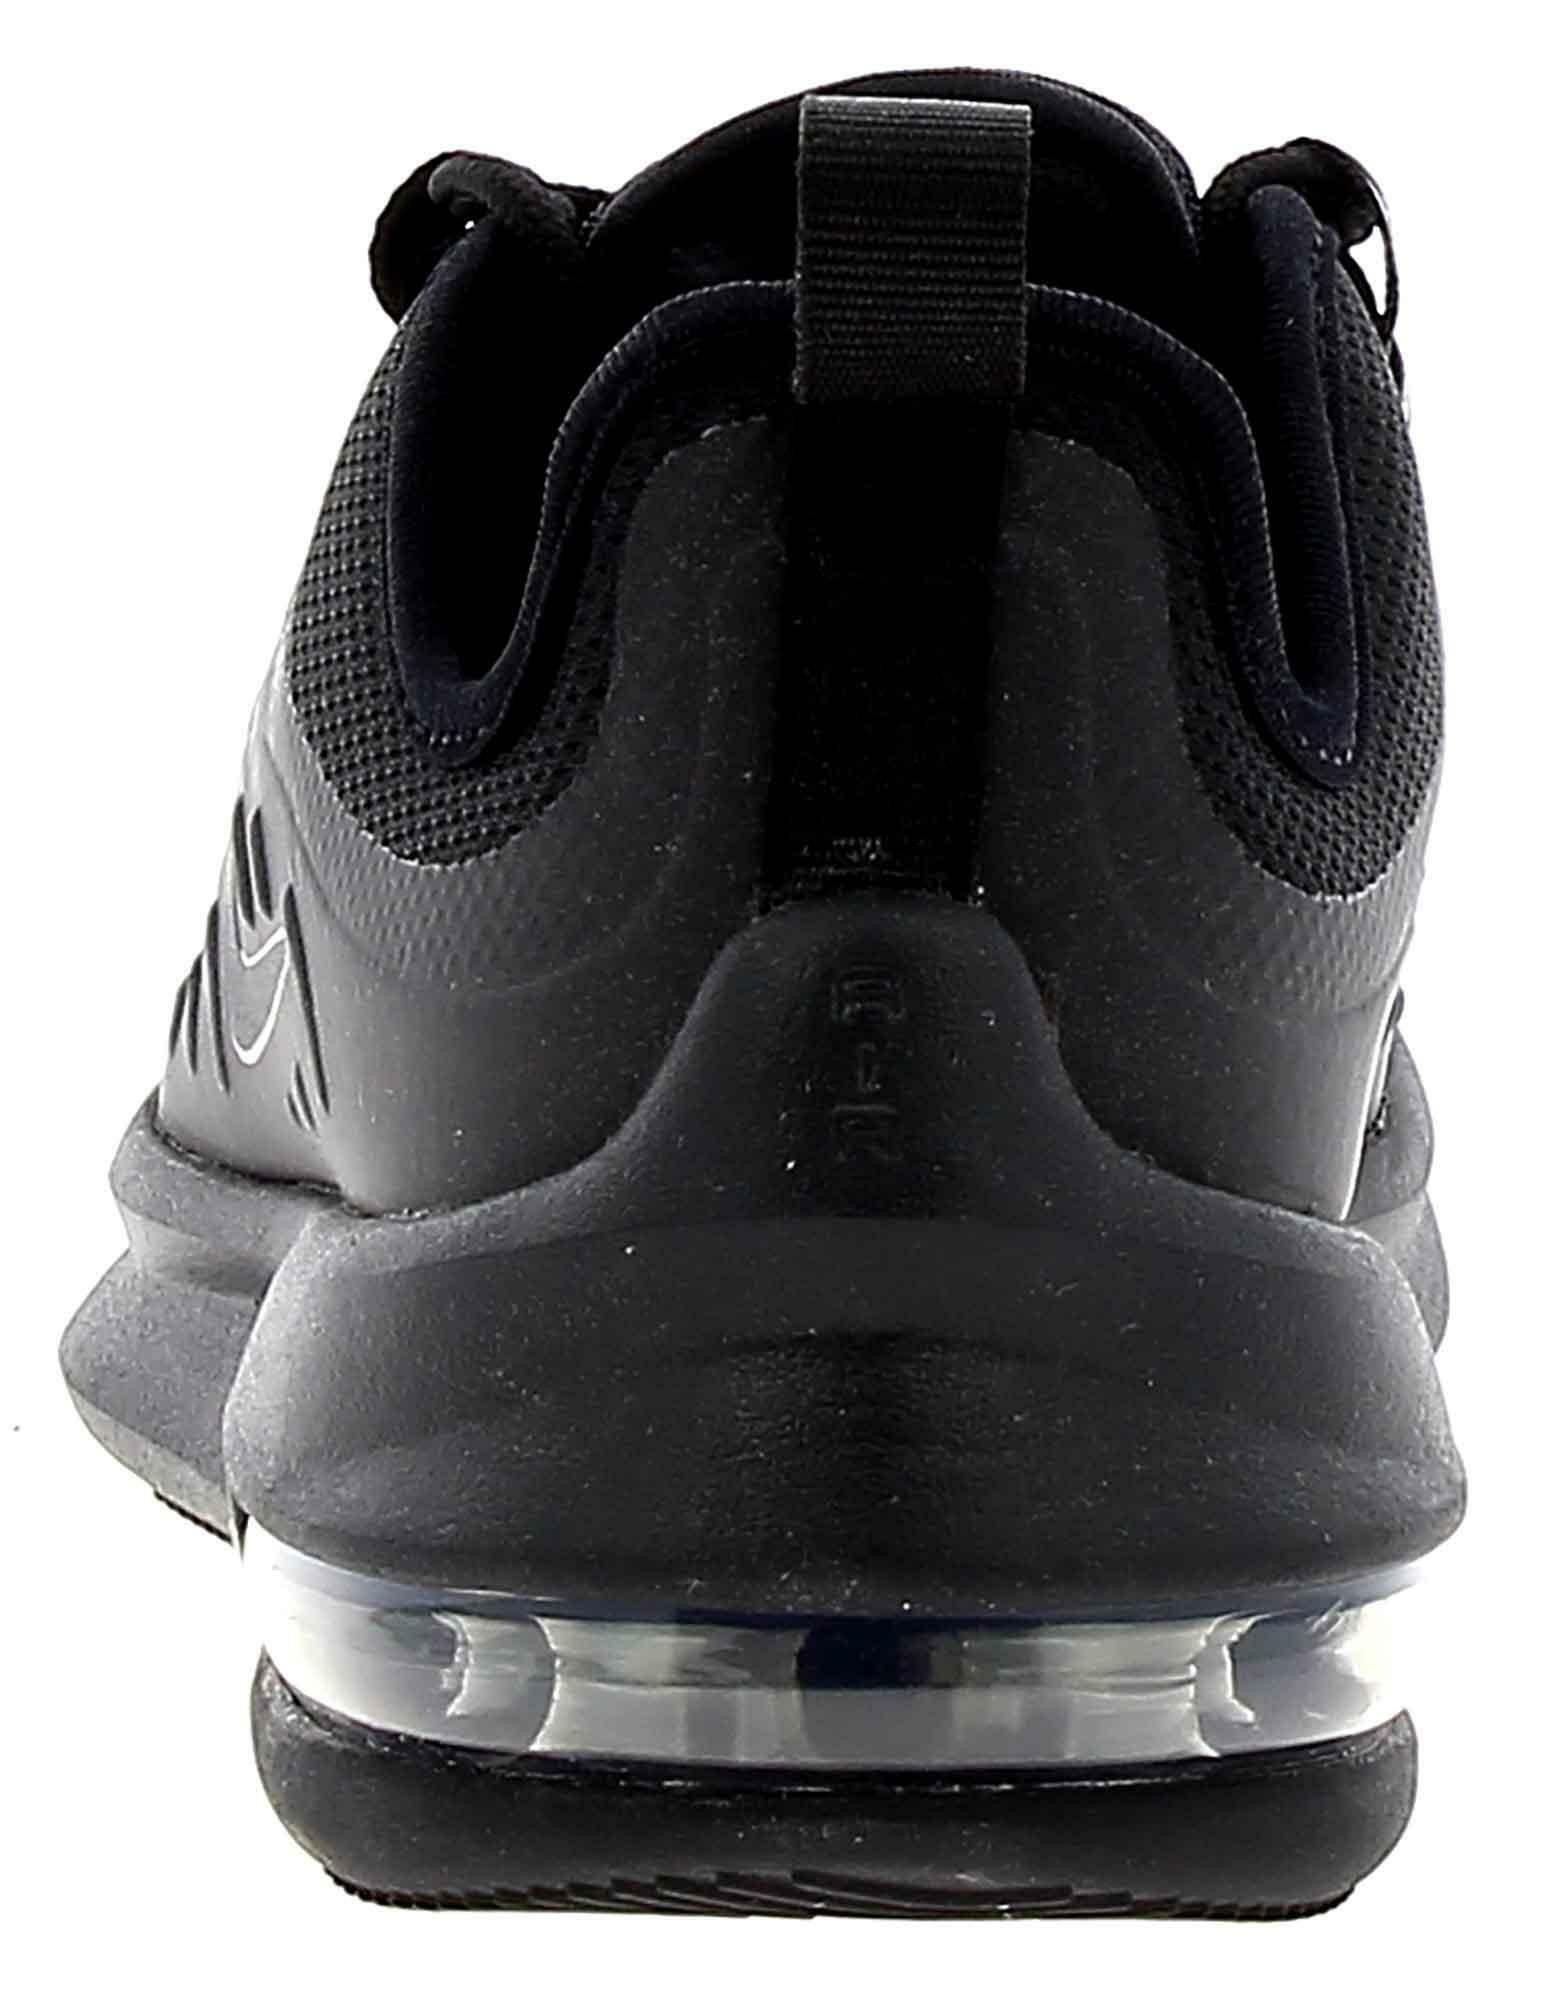 Nike Air Max Axis PS Scarpe Sportive Bambino Nere AH5223006